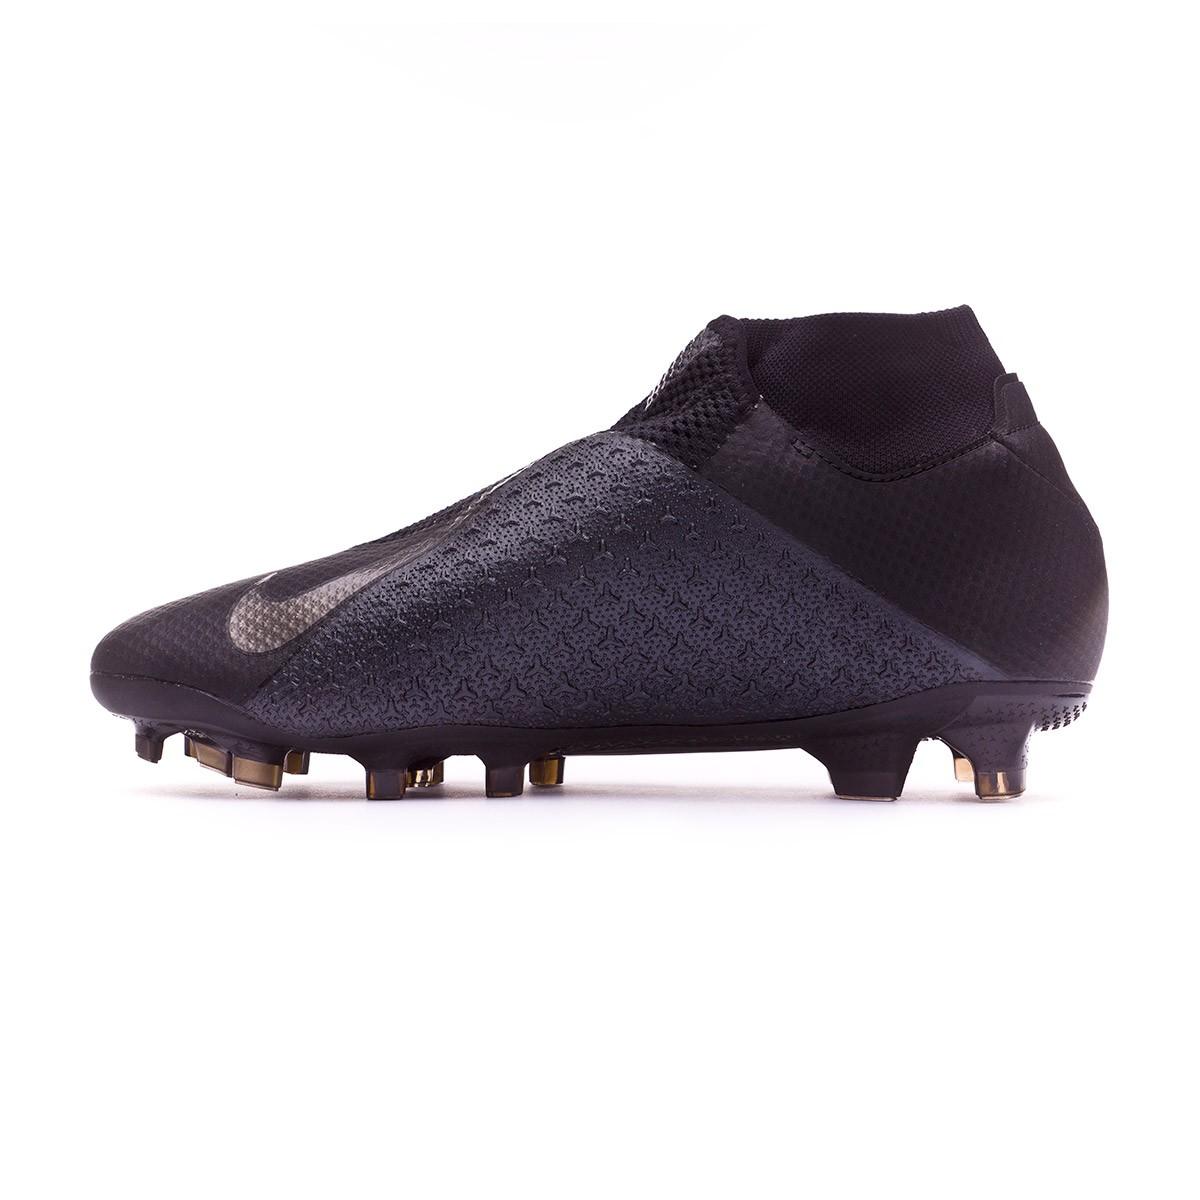 1be7d1bf83db6 Zapatos de fútbol Nike Phantom Vision Pro DF FG Black - Tienda de fútbol  Fútbol Emotion